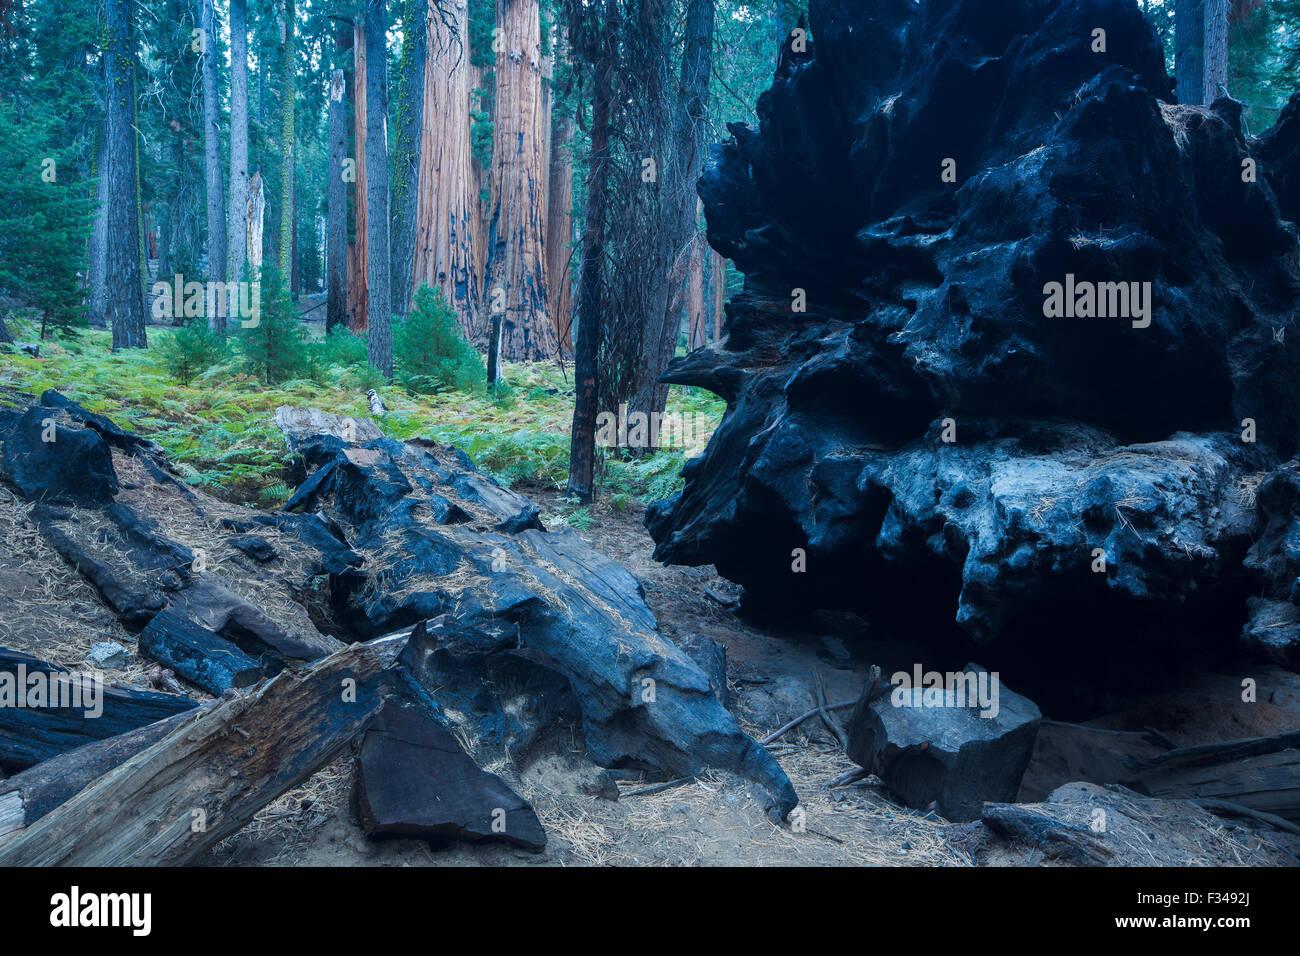 Caduta di una sequoia gigante, albero di Sequoia National Park, California, Stati Uniti d'America Immagini Stock